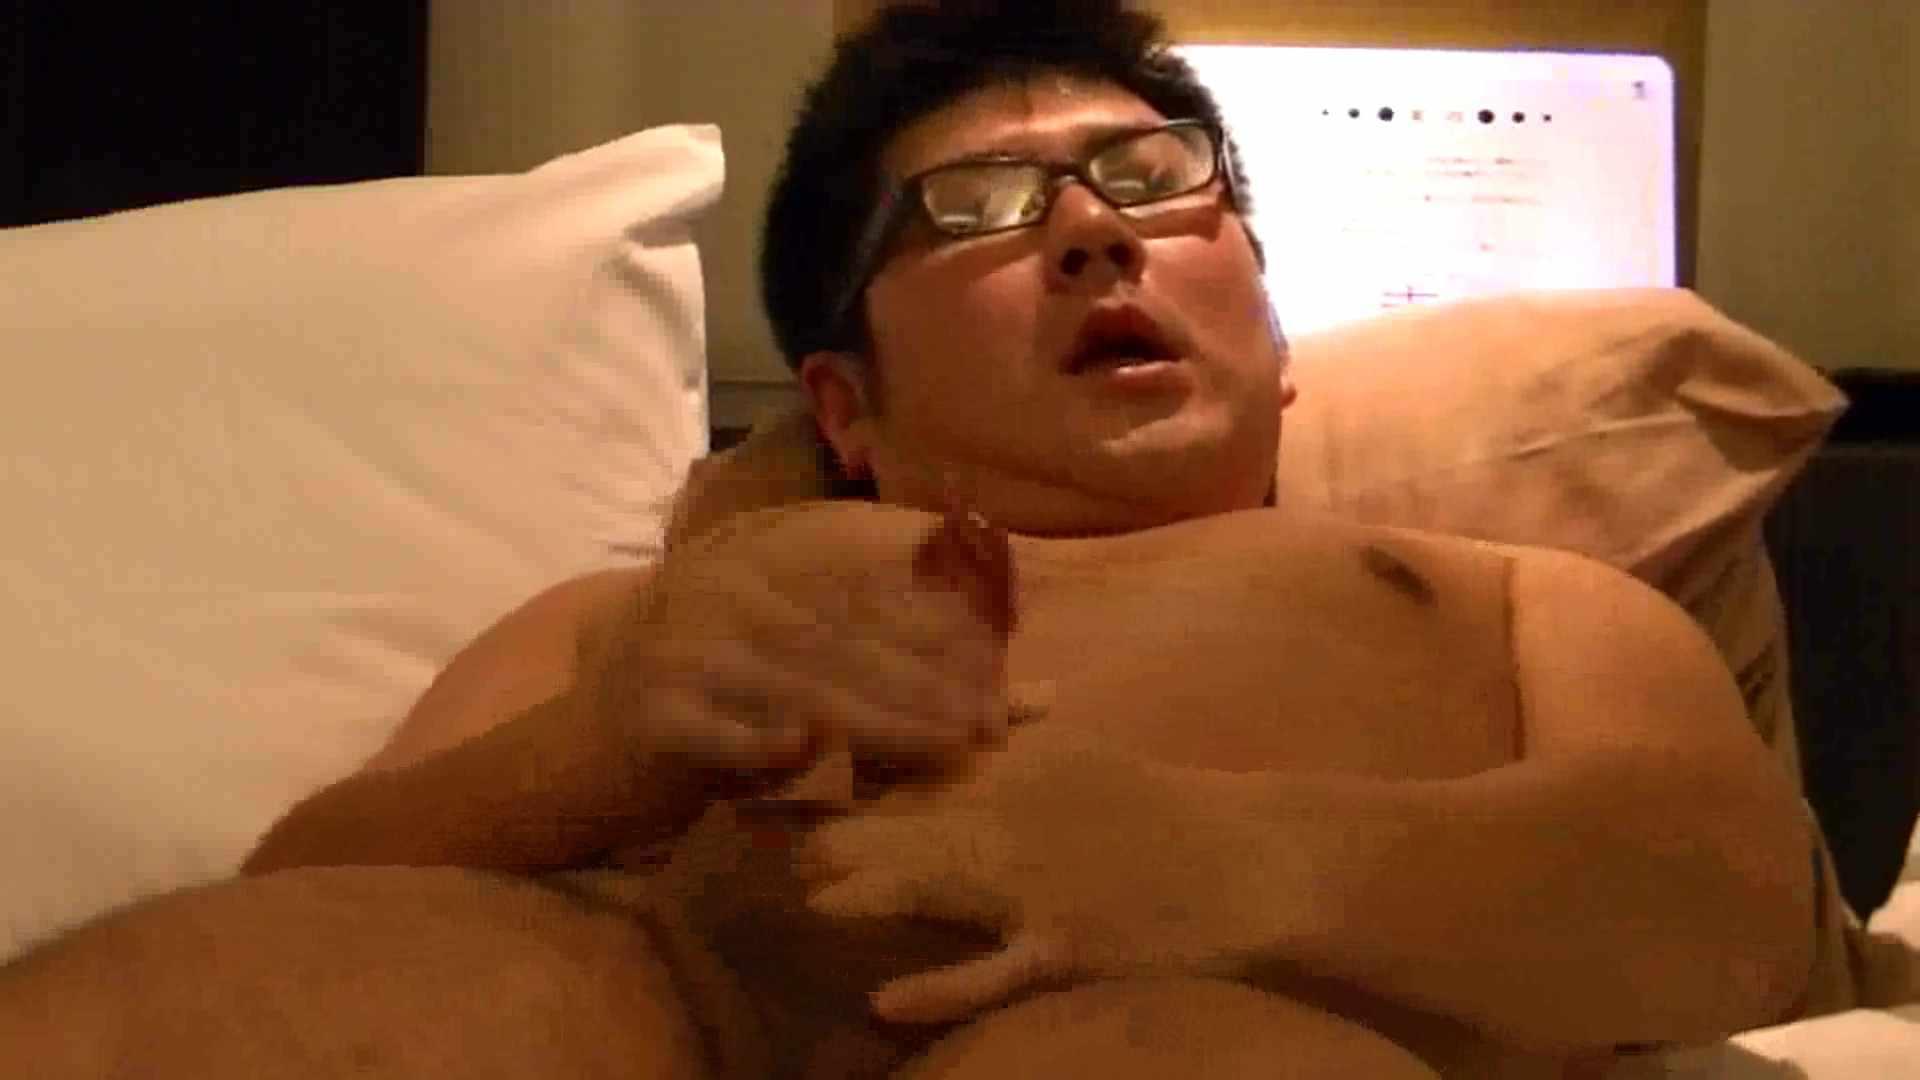 ONA見せカーニバル!! Vol5 モ無し   オナニー エロビデオ紹介 7連発 7